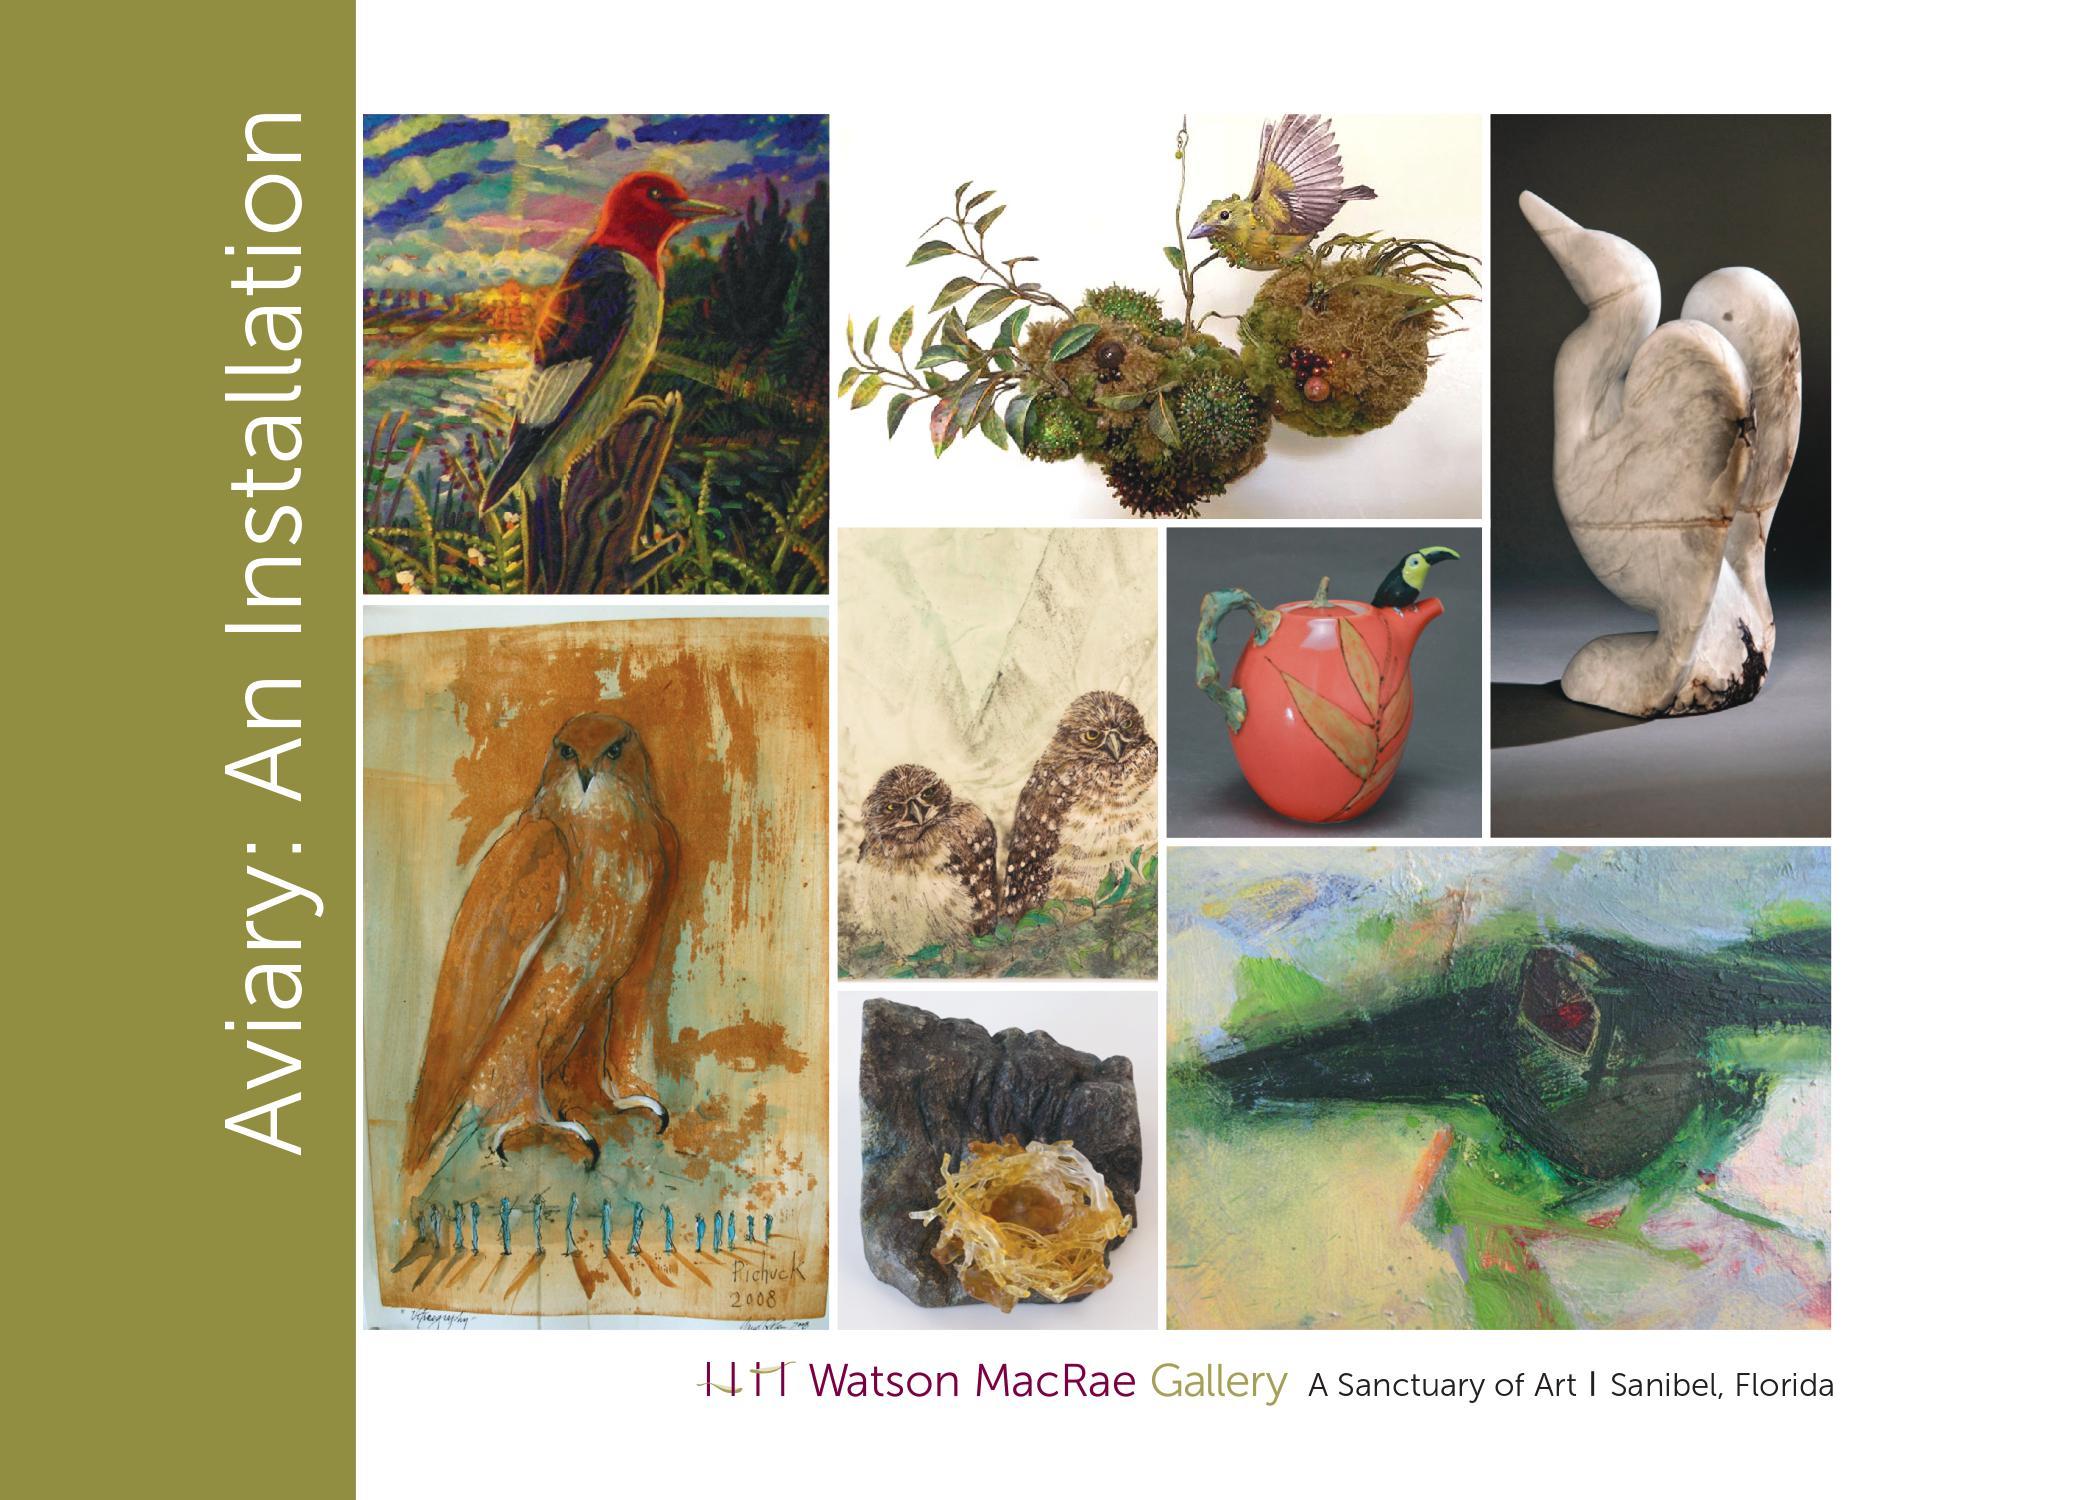 Click image to enlarge  | Artist from top left Mark Messersmith, Amy Gross, Jane Jaskevich, Jane Rosen, Deborah Martin, Lucy Dierks, Ann Hollingsworth and Hollis Jeffcoat